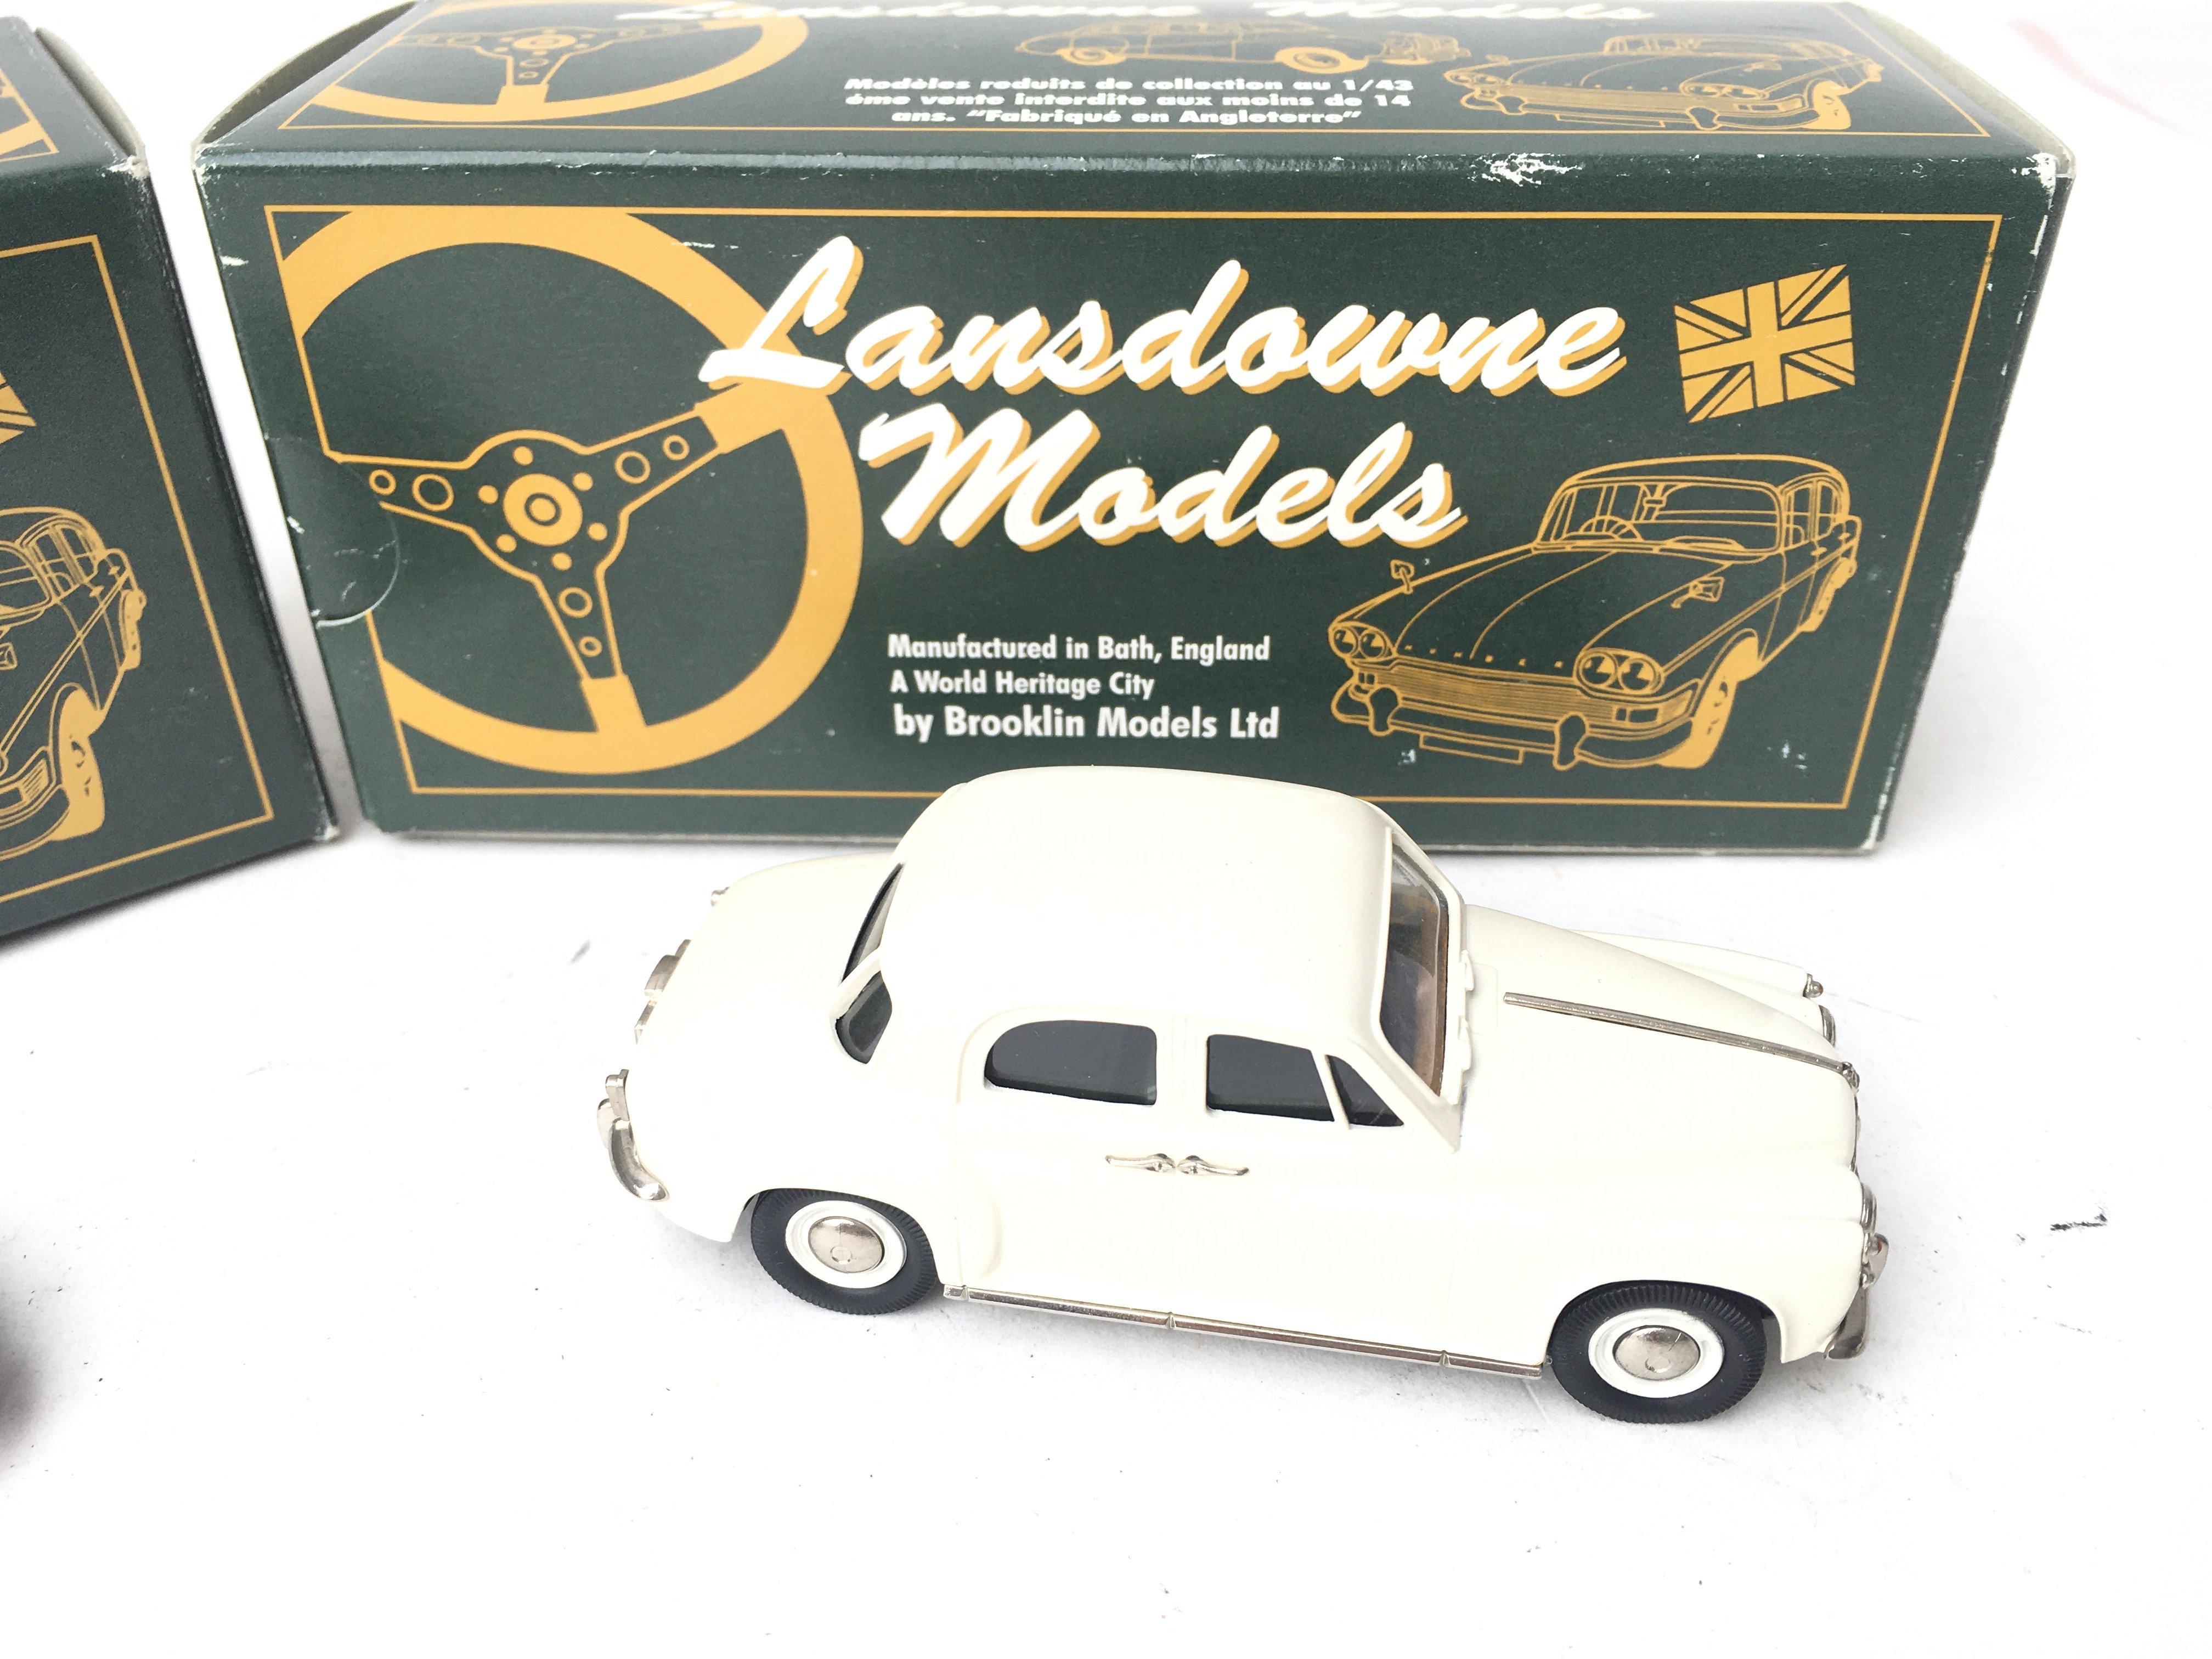 2 X Lansdowne Models. LDM 25 1954 Singer SM Roadst - Image 3 of 3